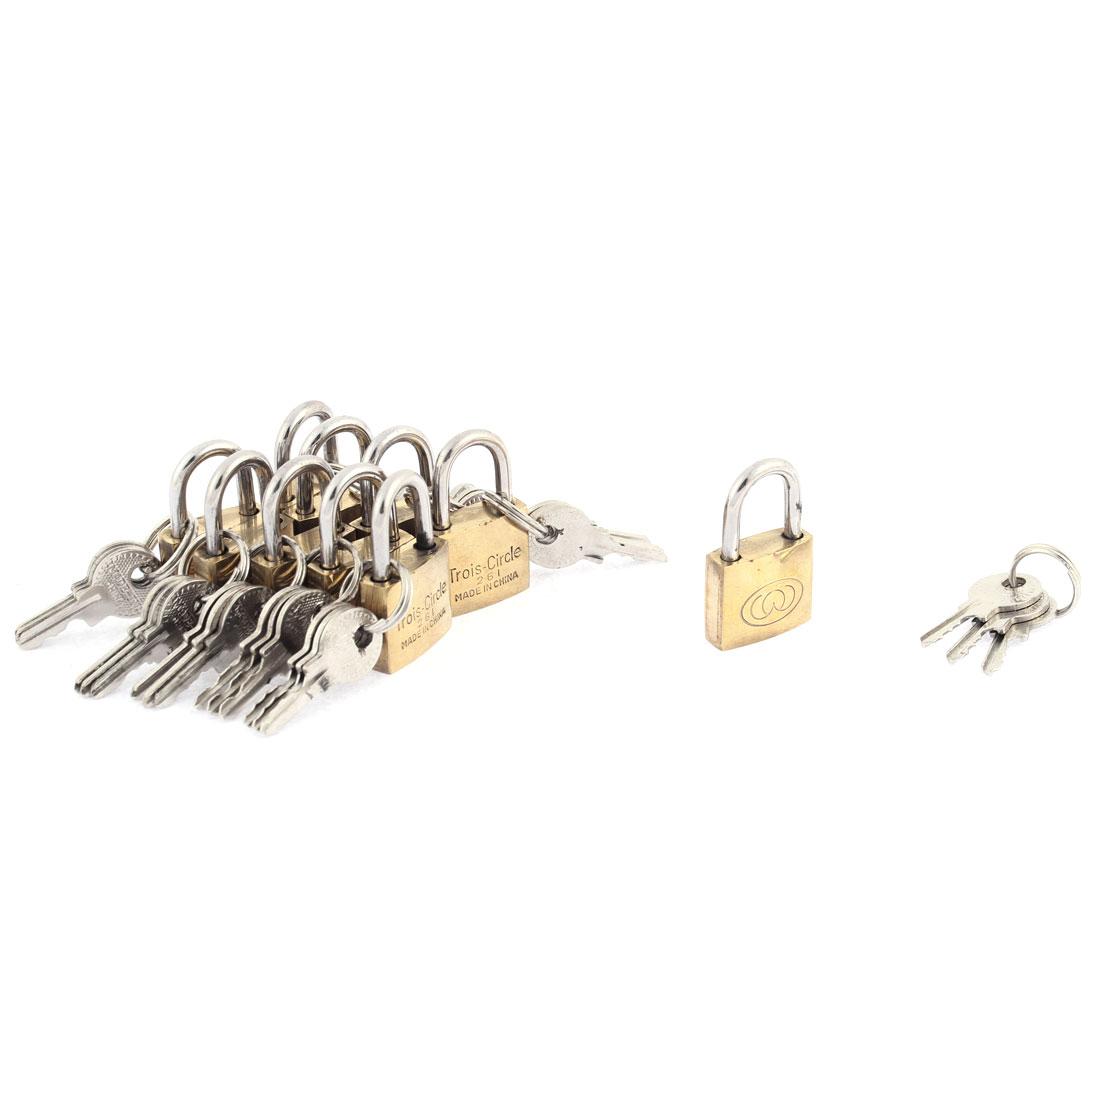 Cabinet Jewlery Box Suitcase Security Lock Padlock 10pcs